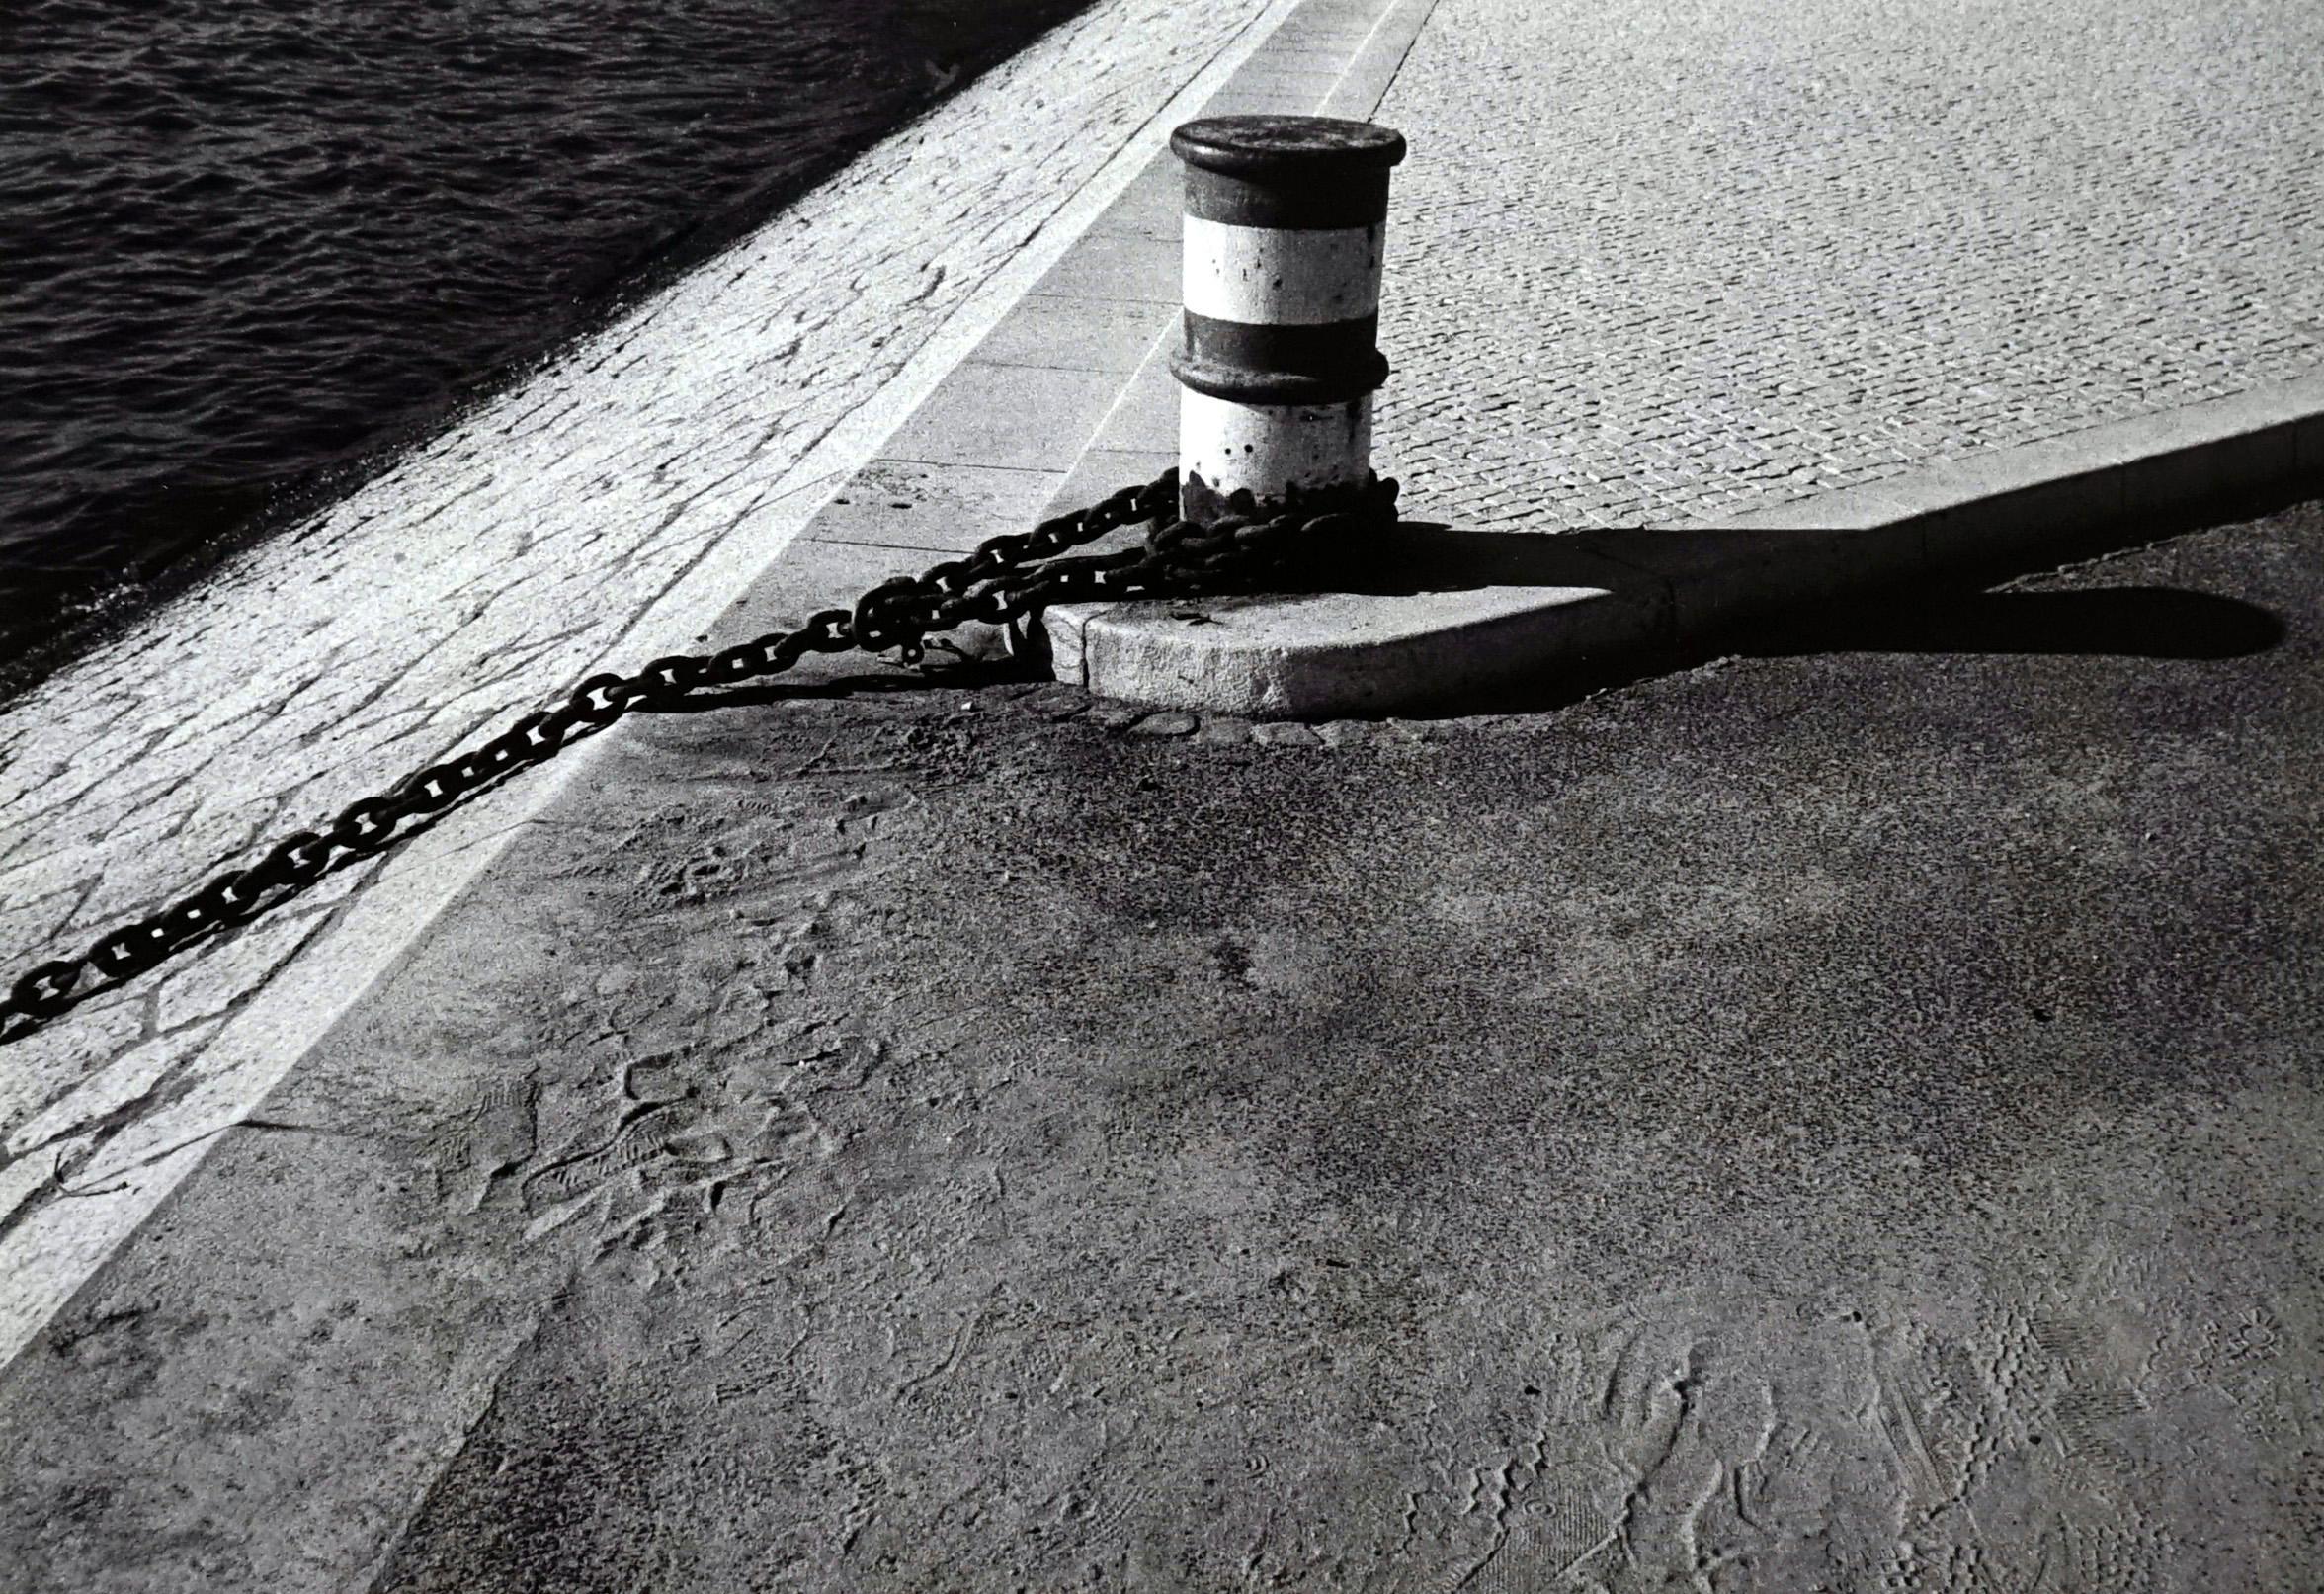 Rivages - Off-Print # 2 -Lisbon - 1982 - Minimalist Black & White Photography